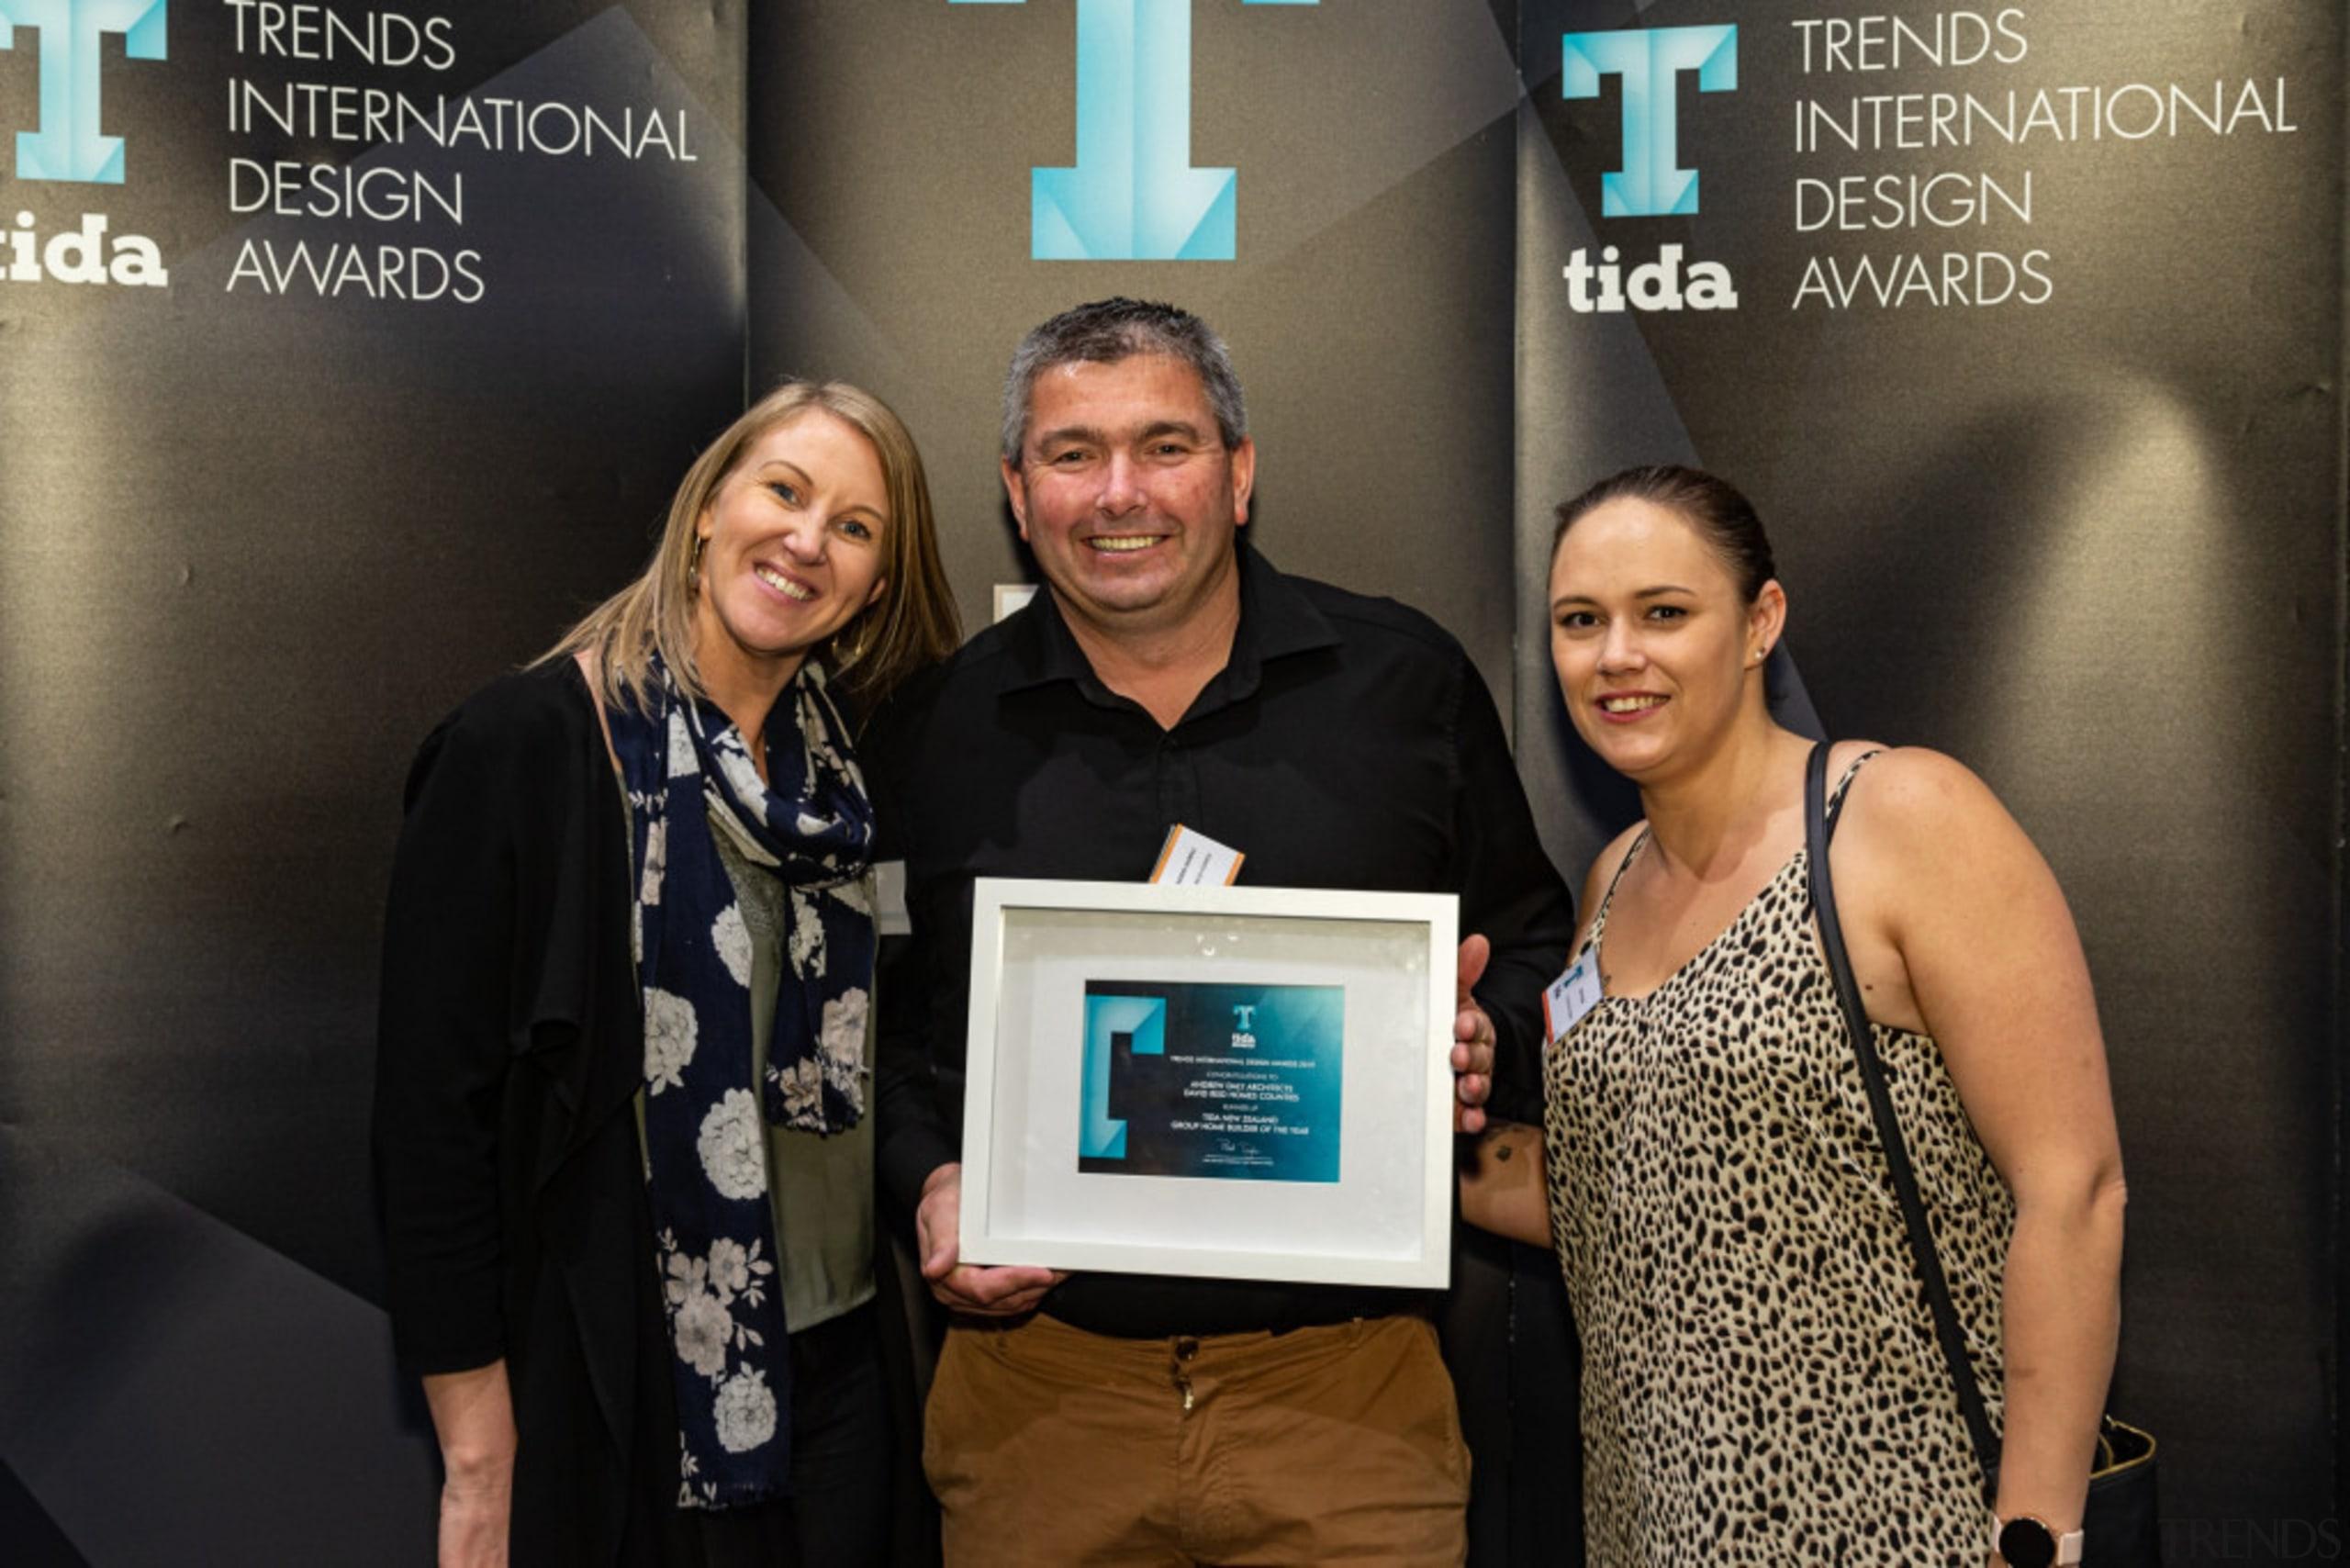 2019 TIDA New Zealand Homes presentation evening award, award ceremony, electronic device, event, photography, technology, black